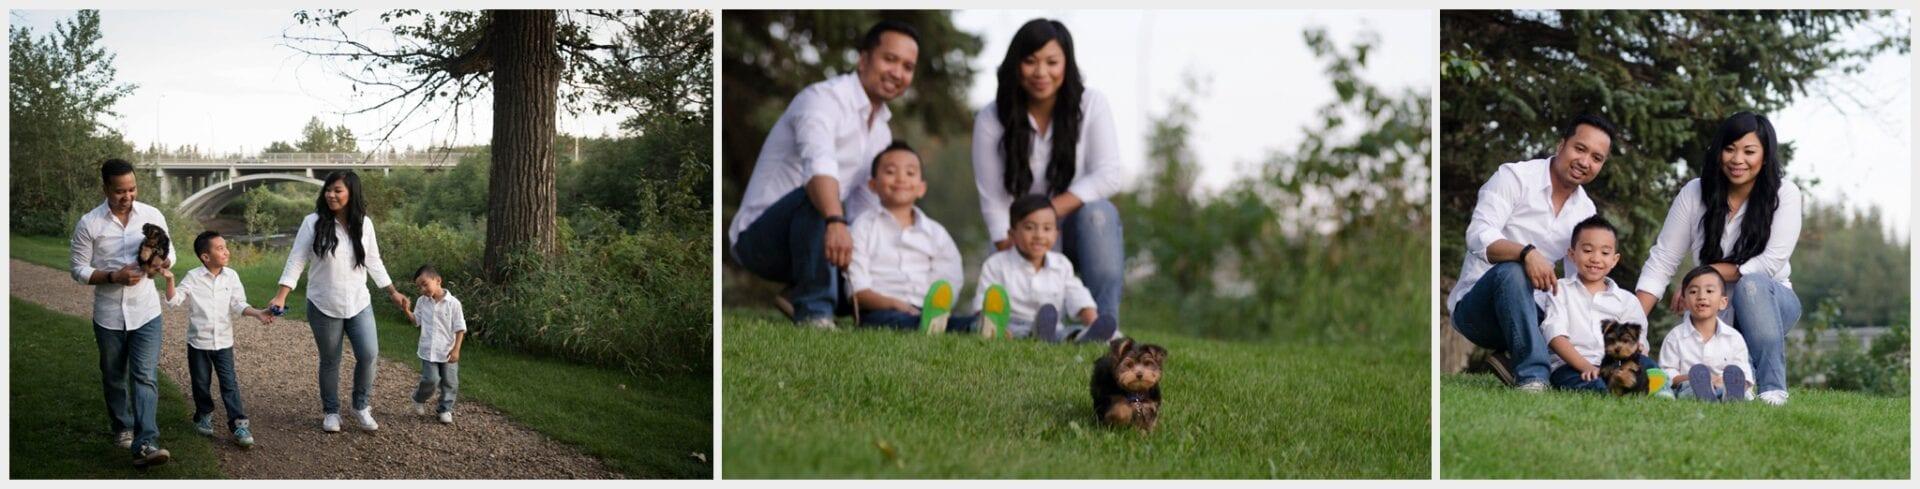 Fox Drive Whitemud Park Edmonton Family Photography Session-_0004